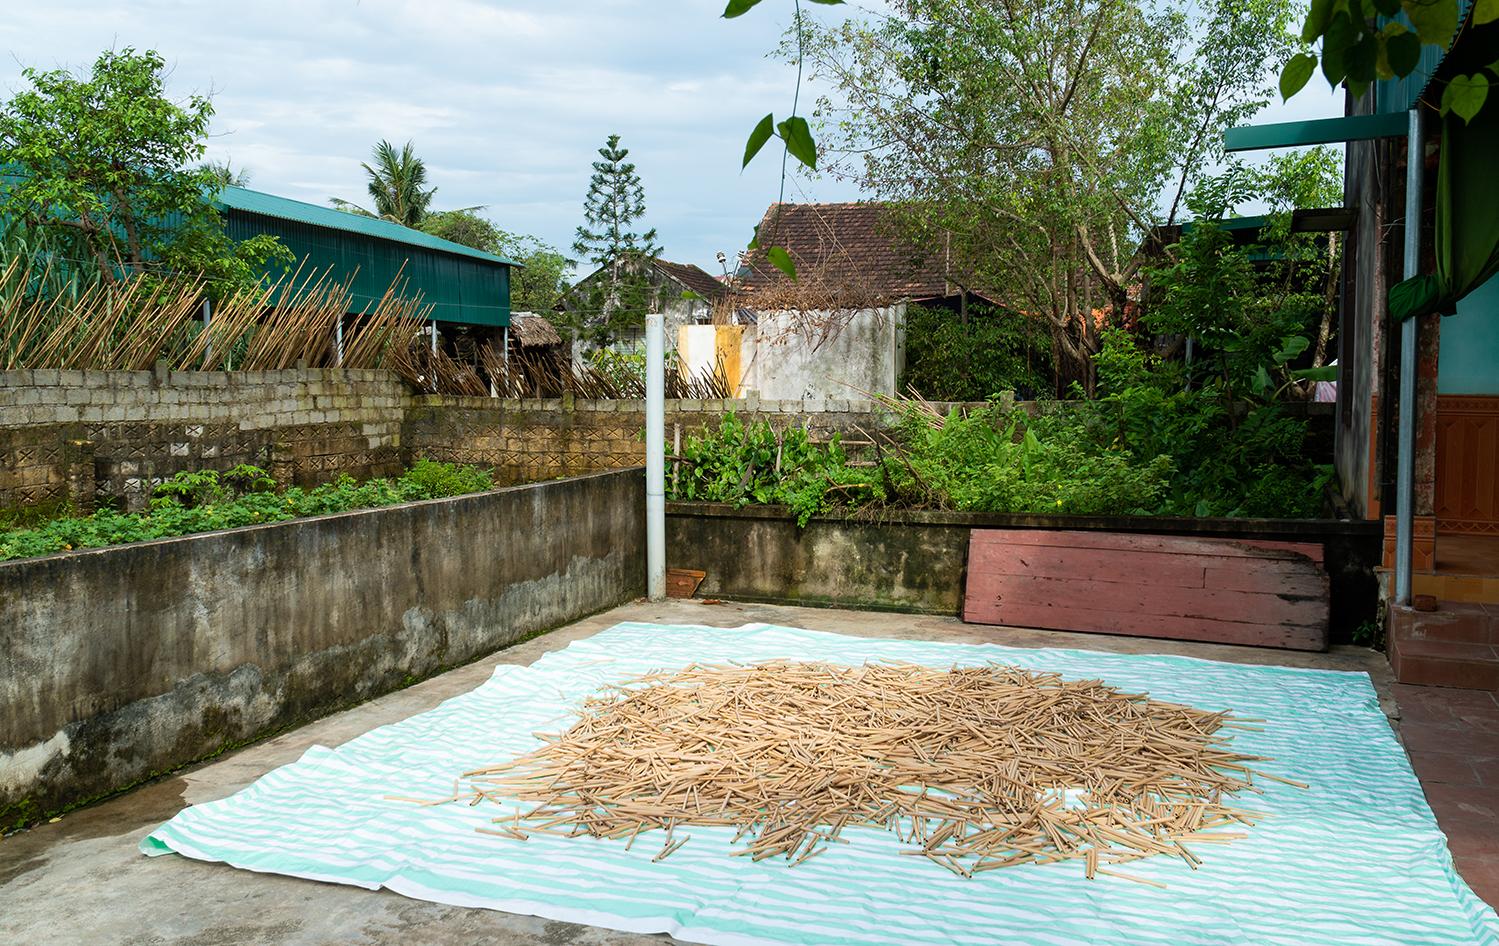 benefits of bamboo straws-Bamboo-Straws-Drying-Outside-Jungle-Straw.jpg